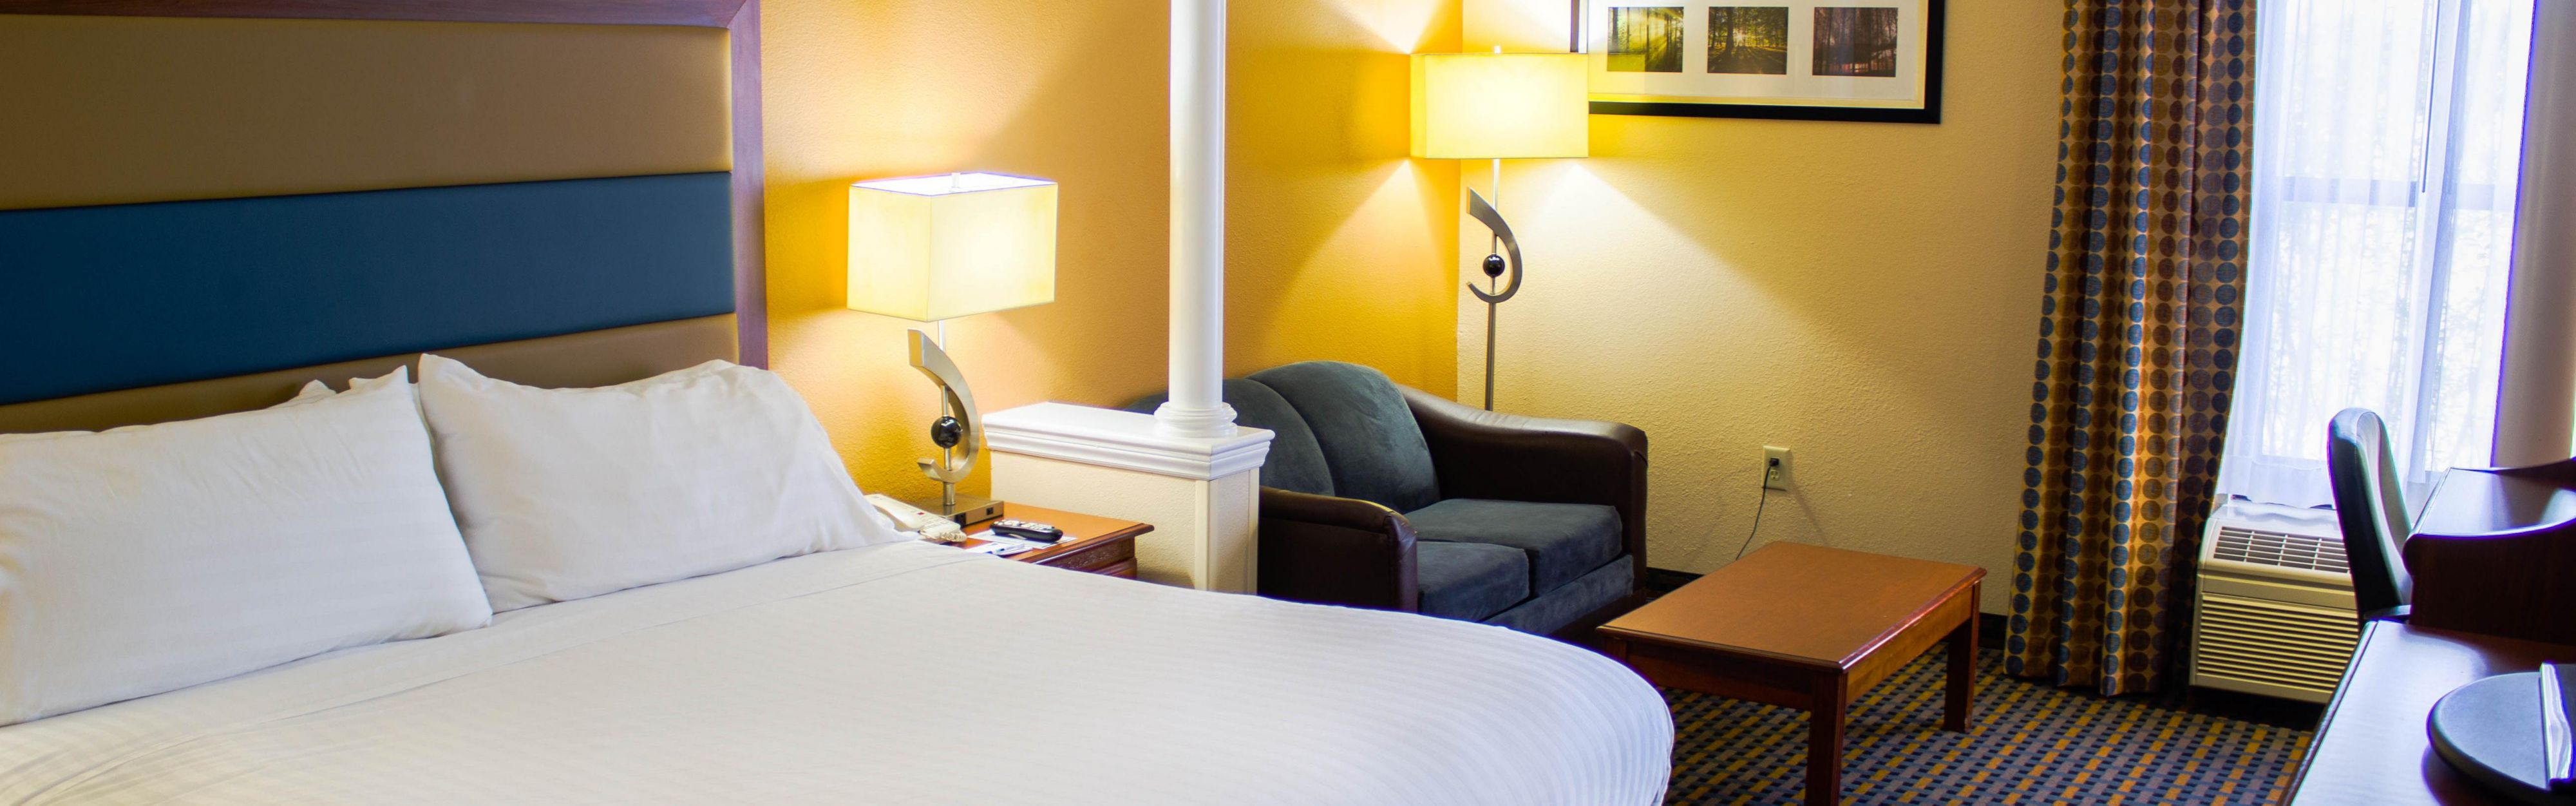 Holiday Inn Express & Suites Sanford image 1